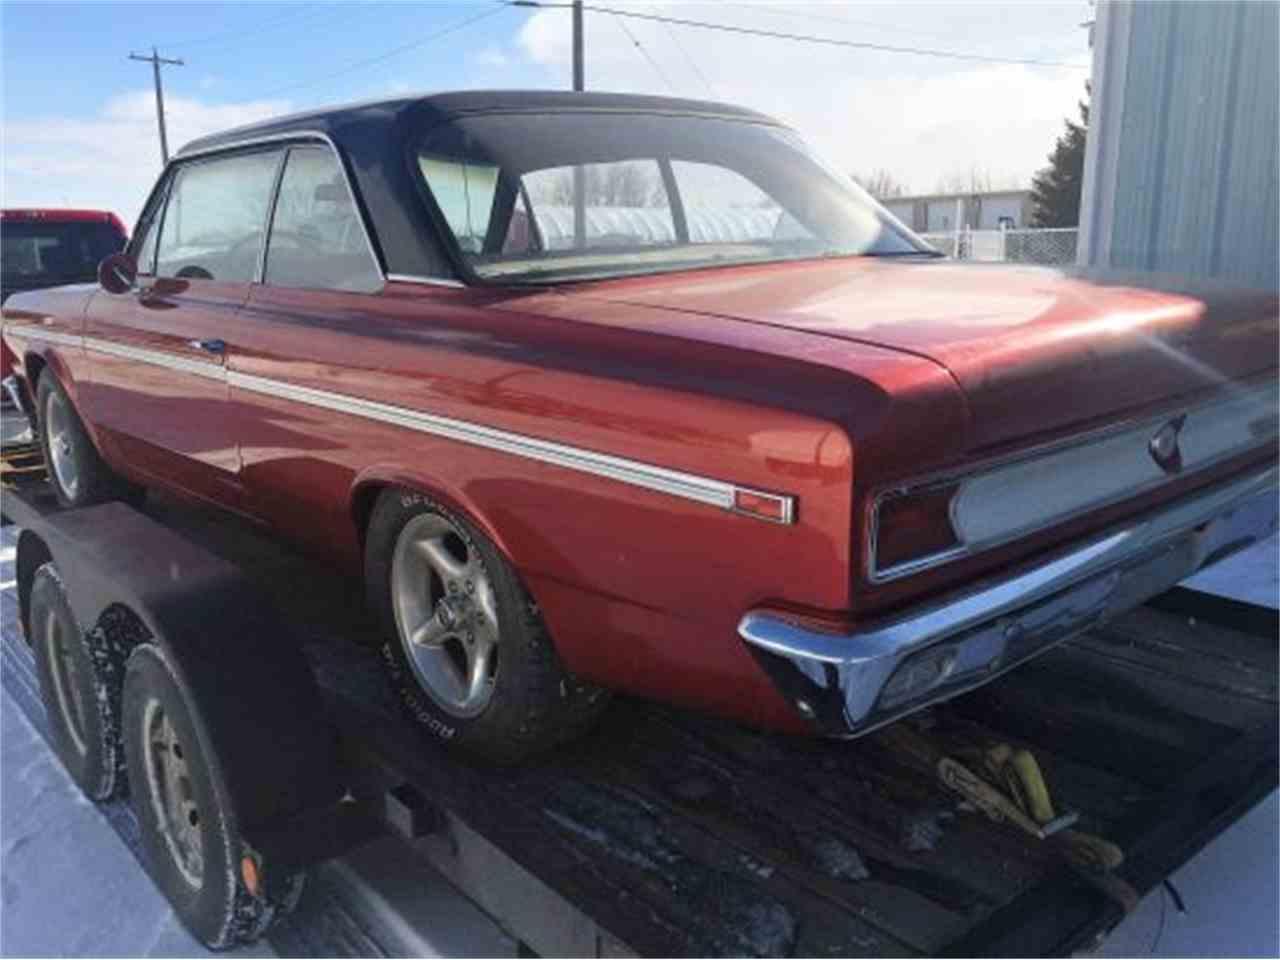 Edmonton Alberta Used Vehicles Cars Trucks Suvs For Sale: 1968 AMC Rambler For Sale